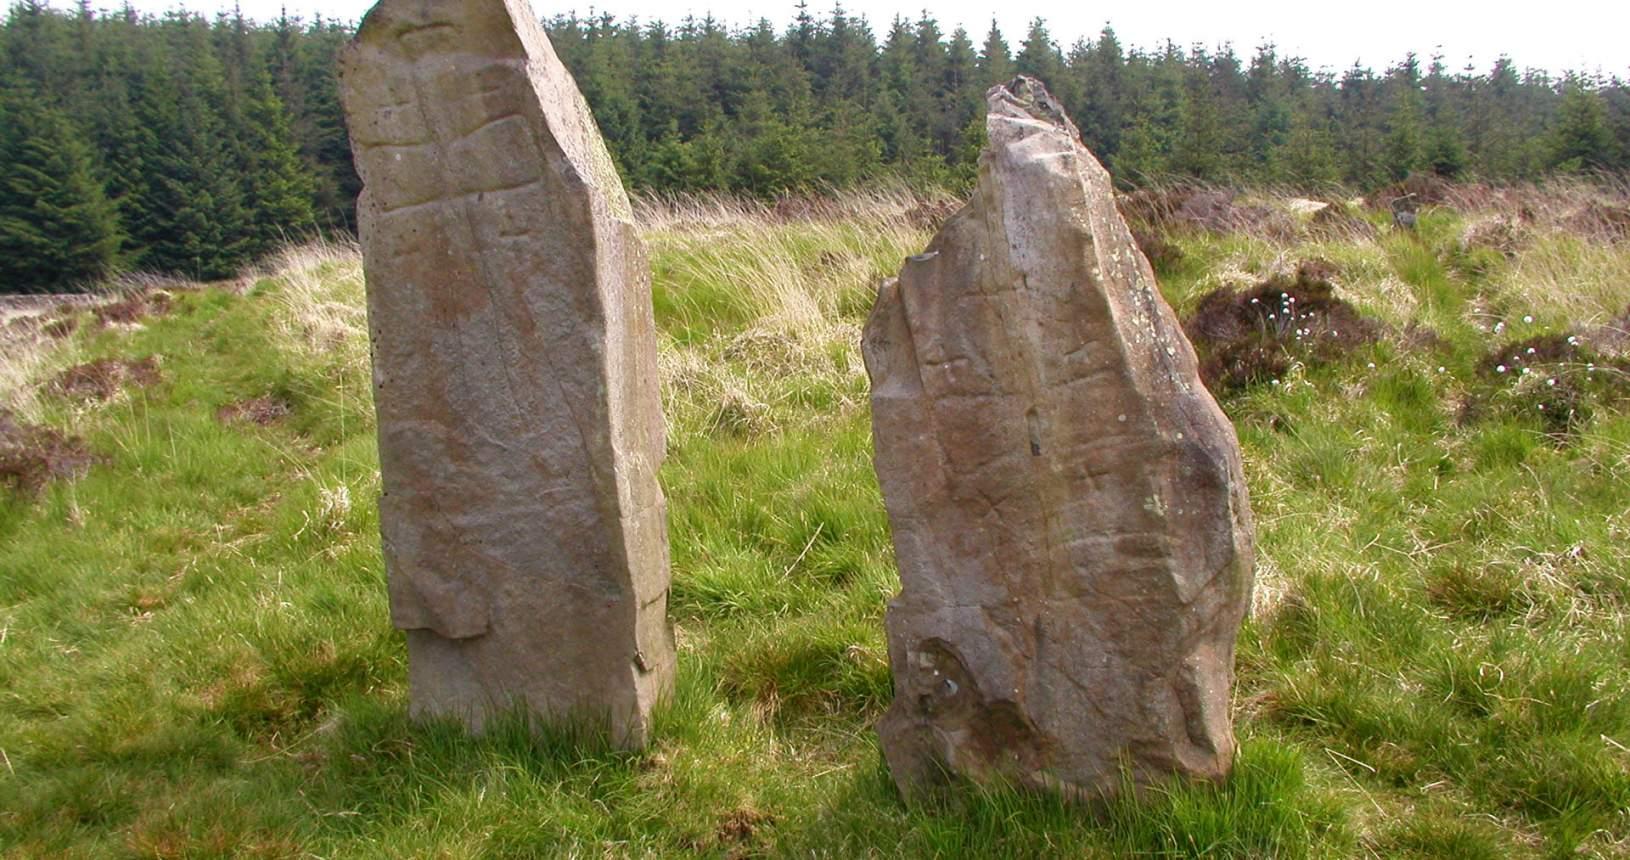 Laggangarn Stones